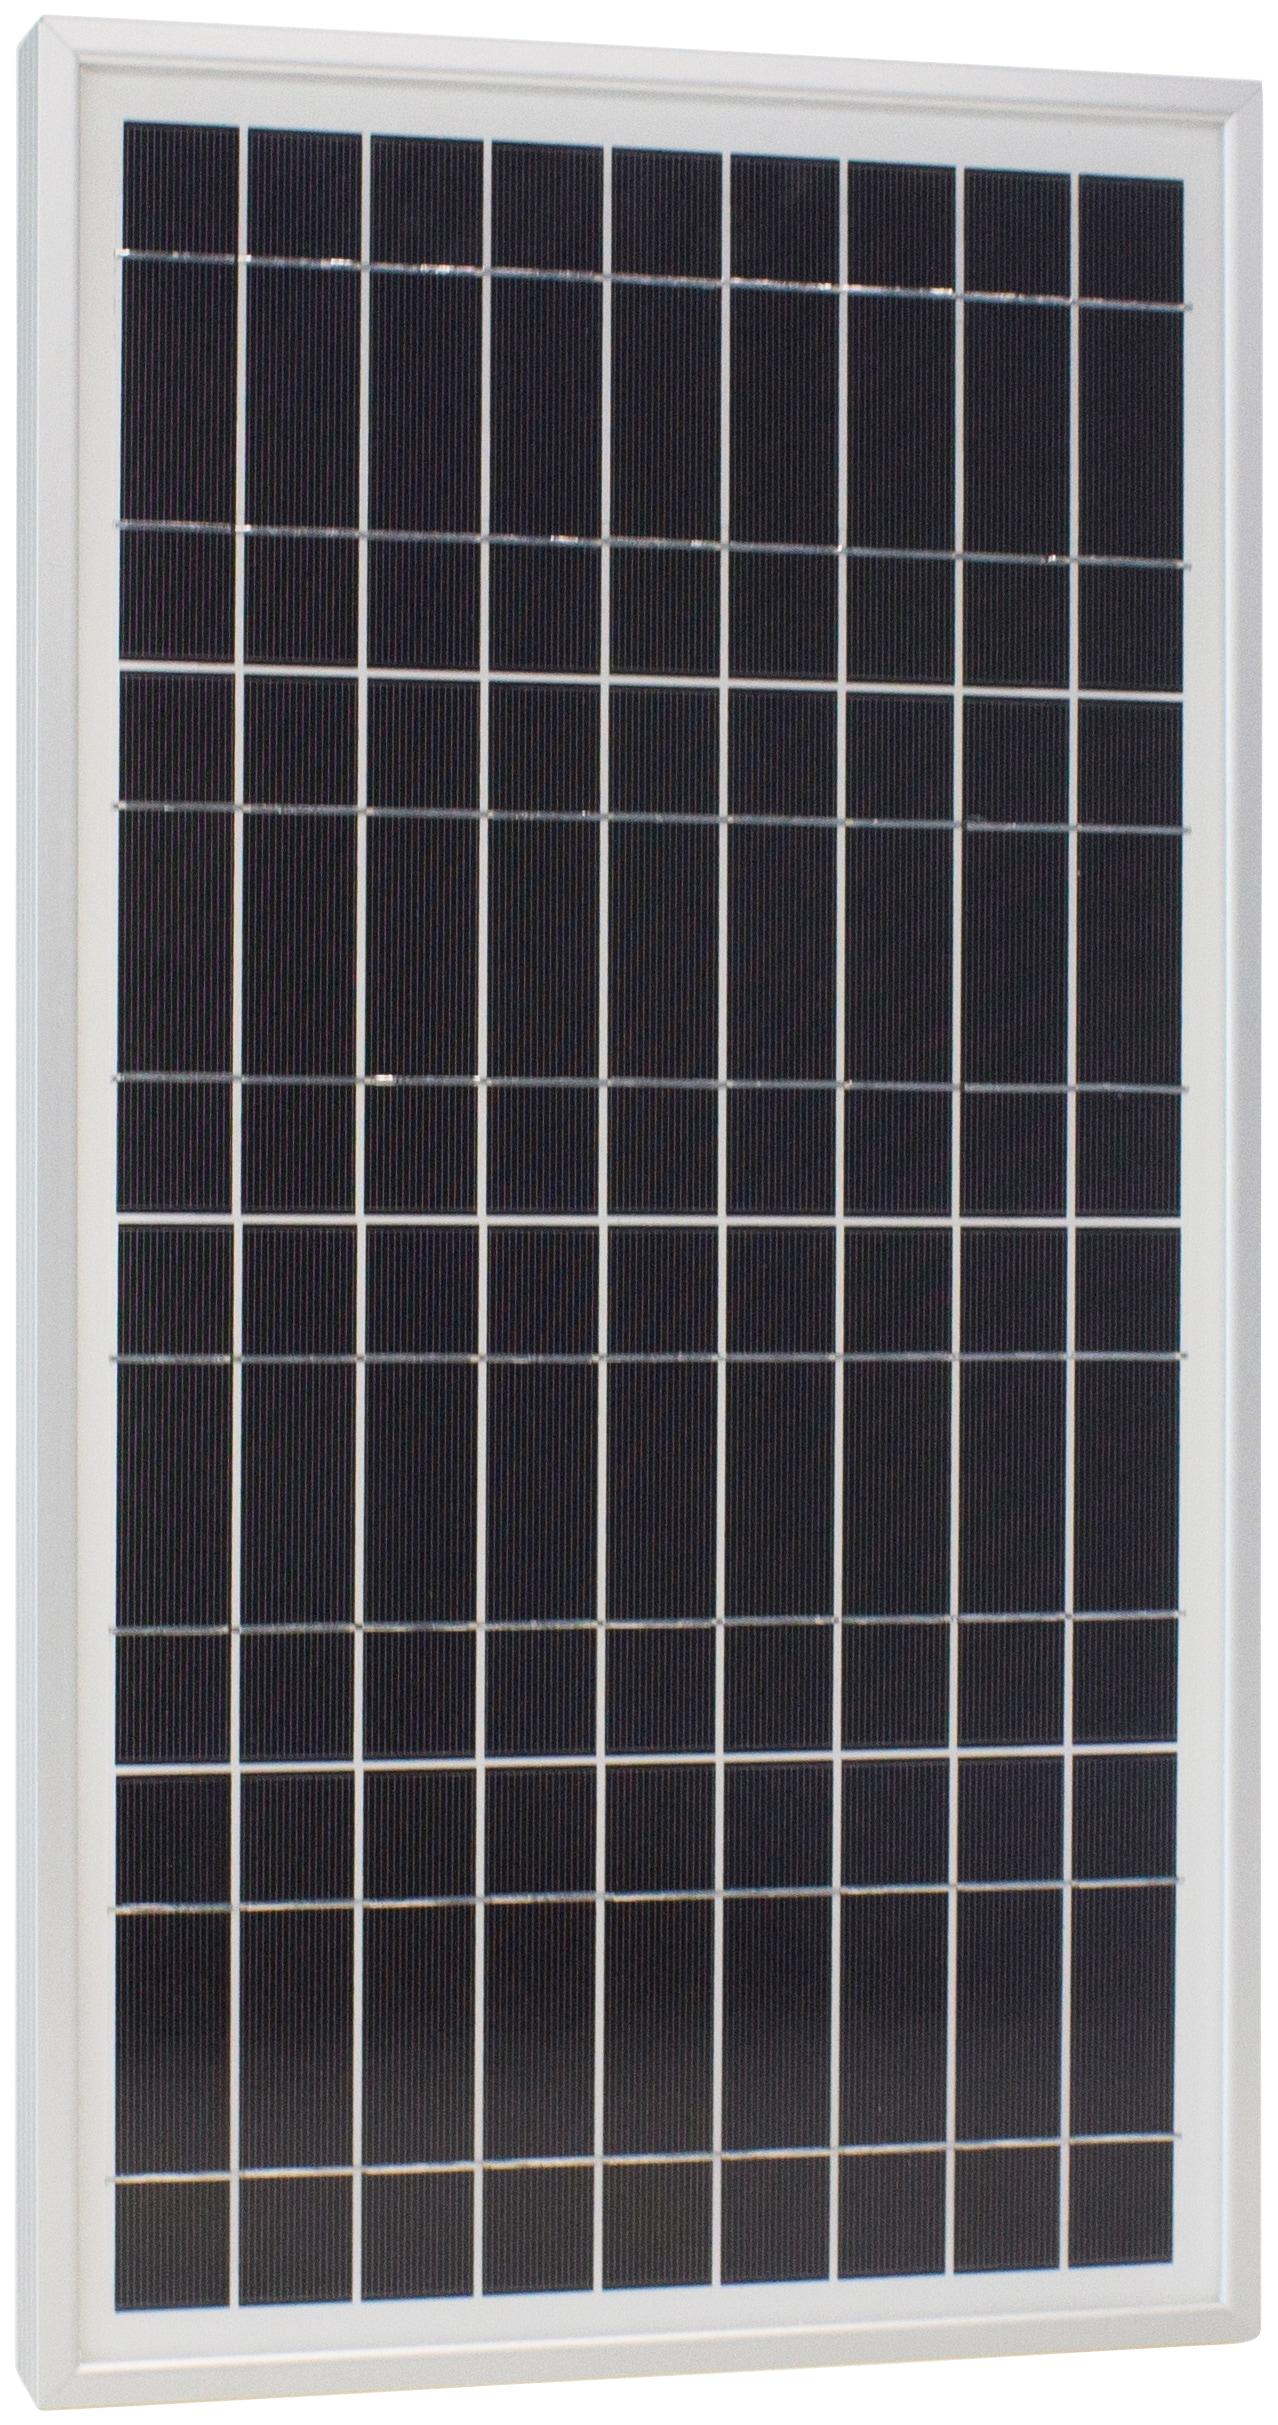 Phaesun Solarmodul Sun Plus 20 S, W, 12 VDC silberfarben Solartechnik Bauen Renovieren